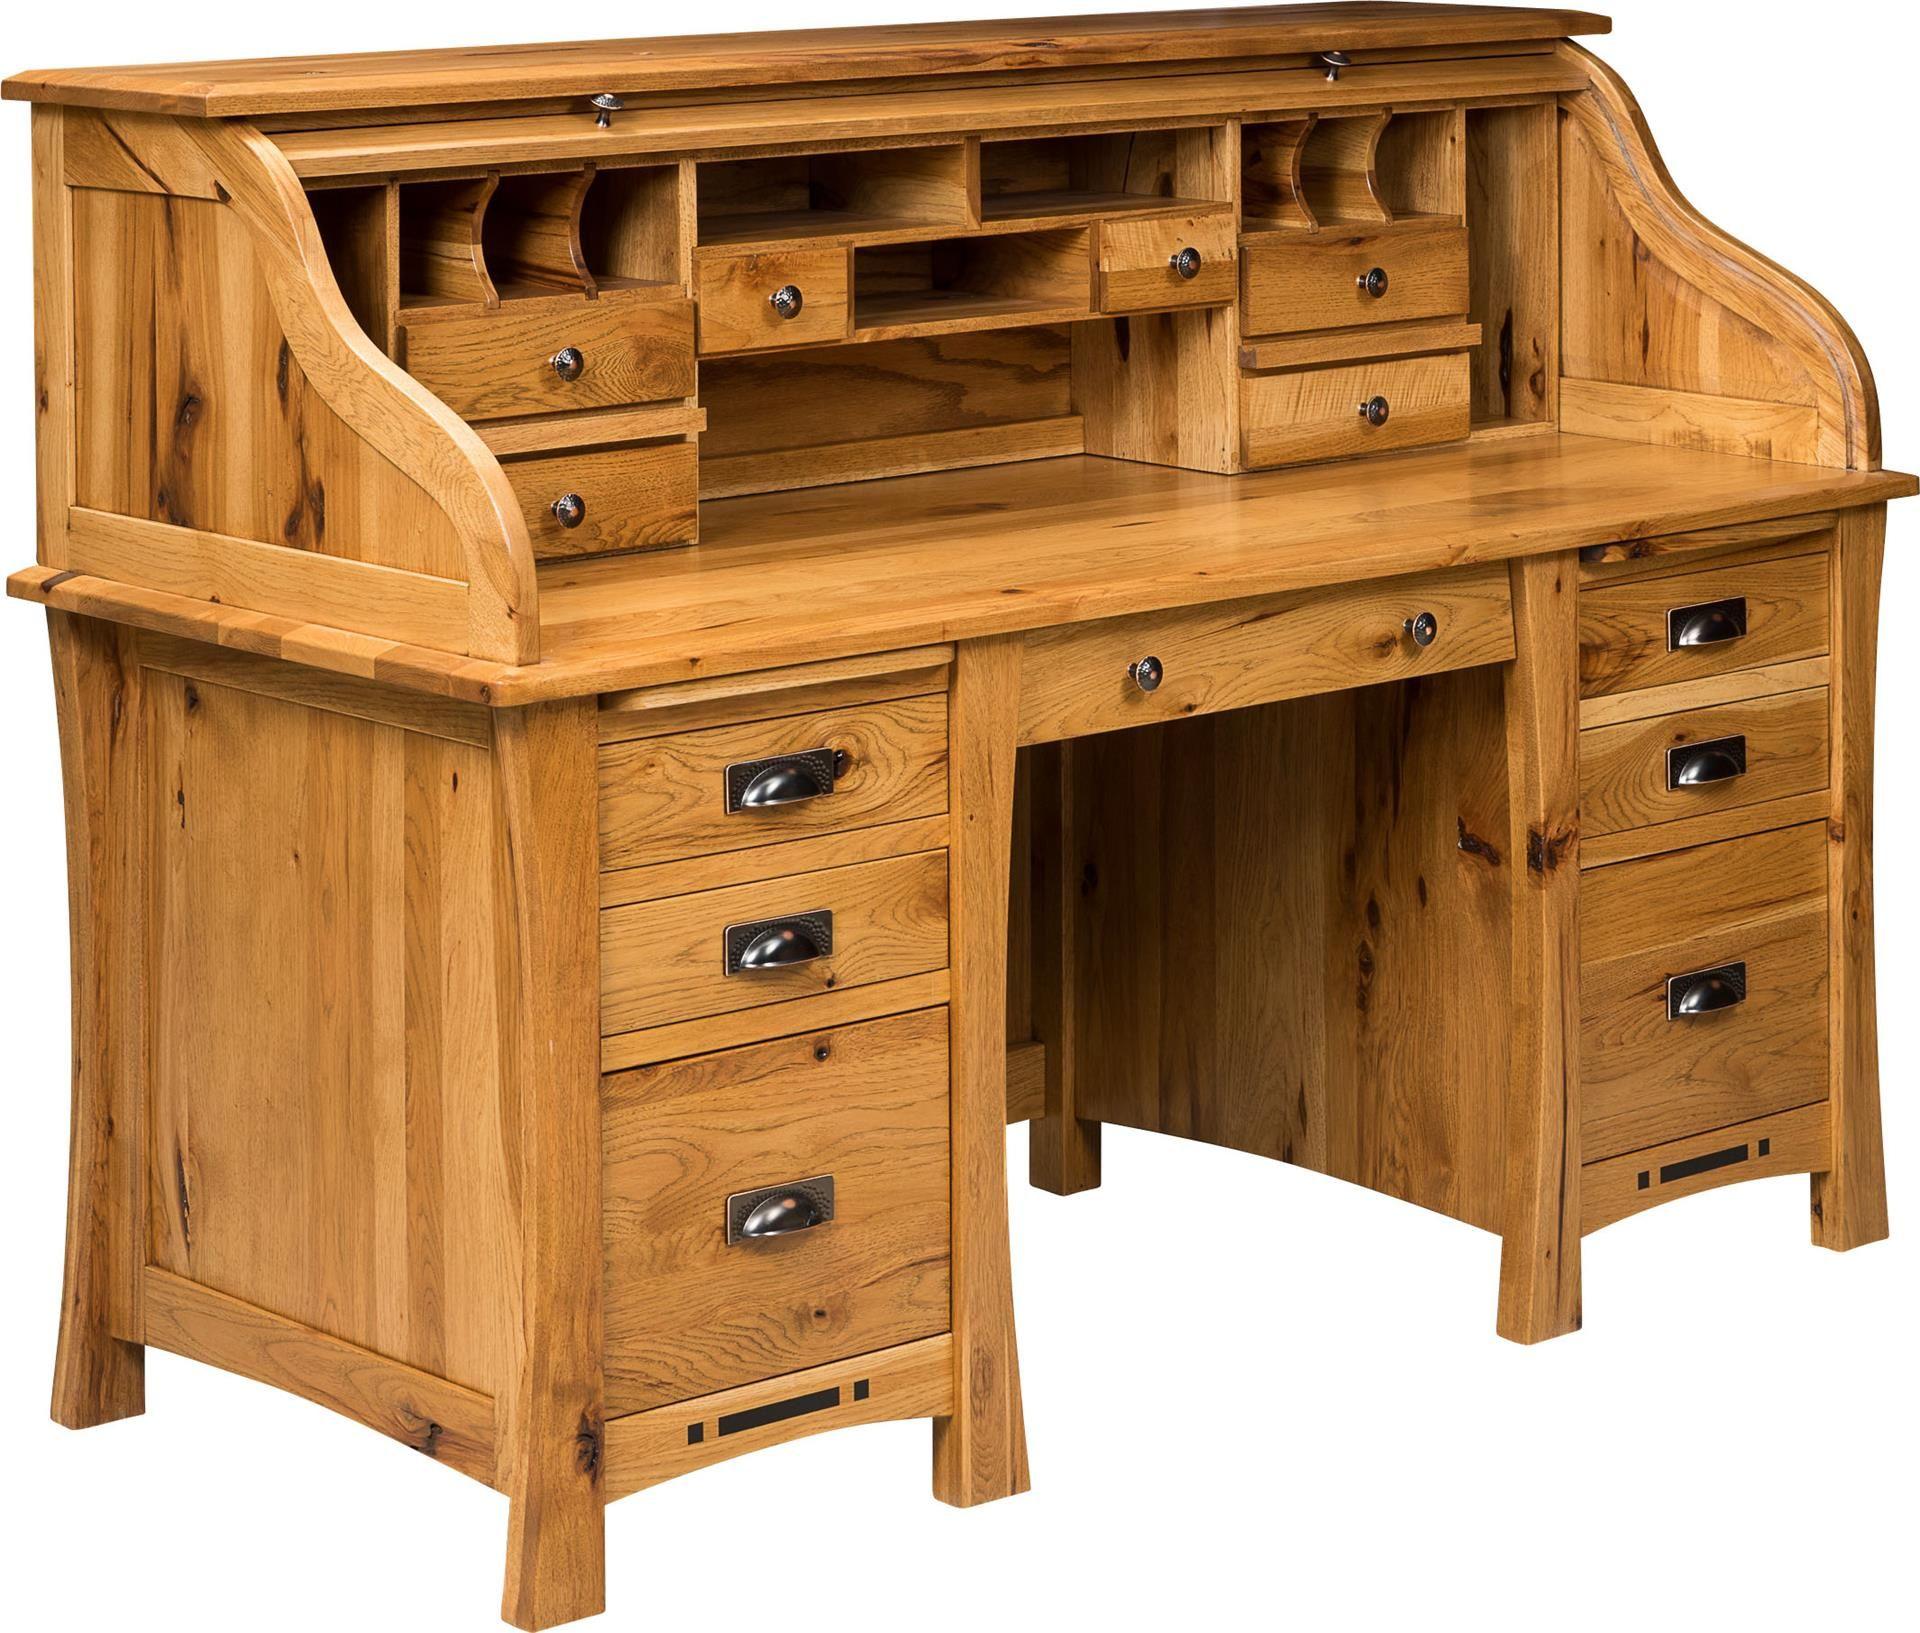 Amish Arts And Crafts Rolltop Desk Woodworking Desk Plans